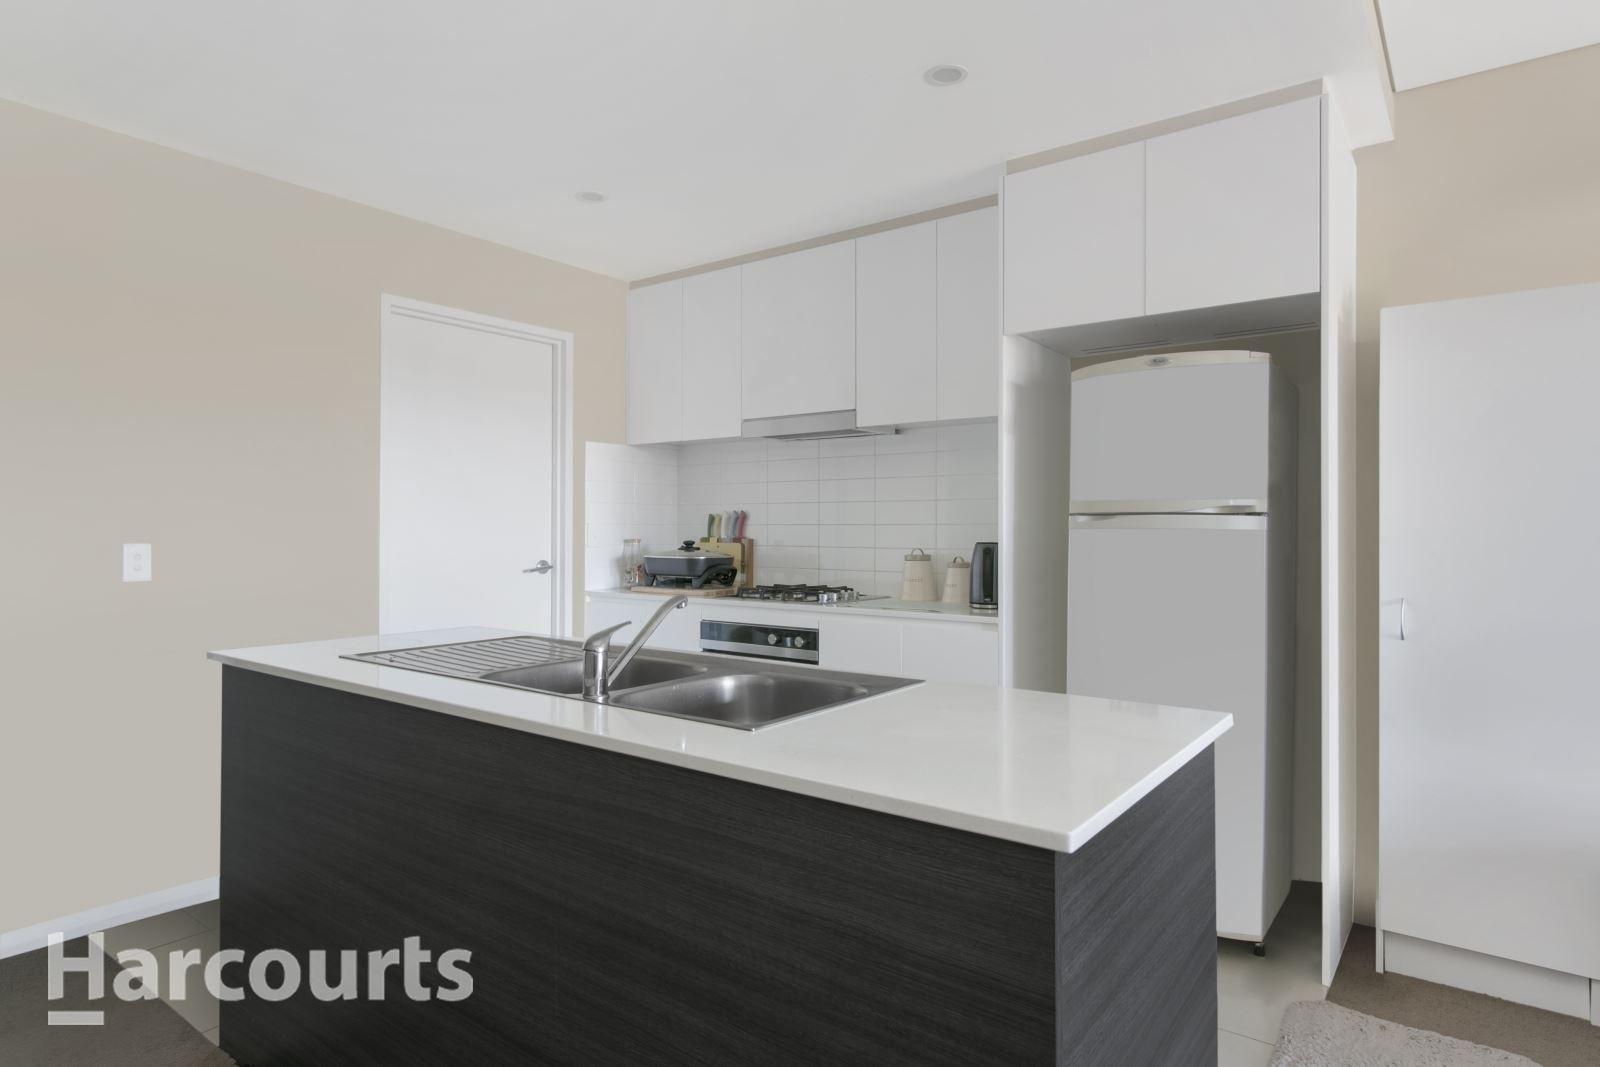 59/2-10 Tyler Street, Campbelltown NSW 2560, Image 2